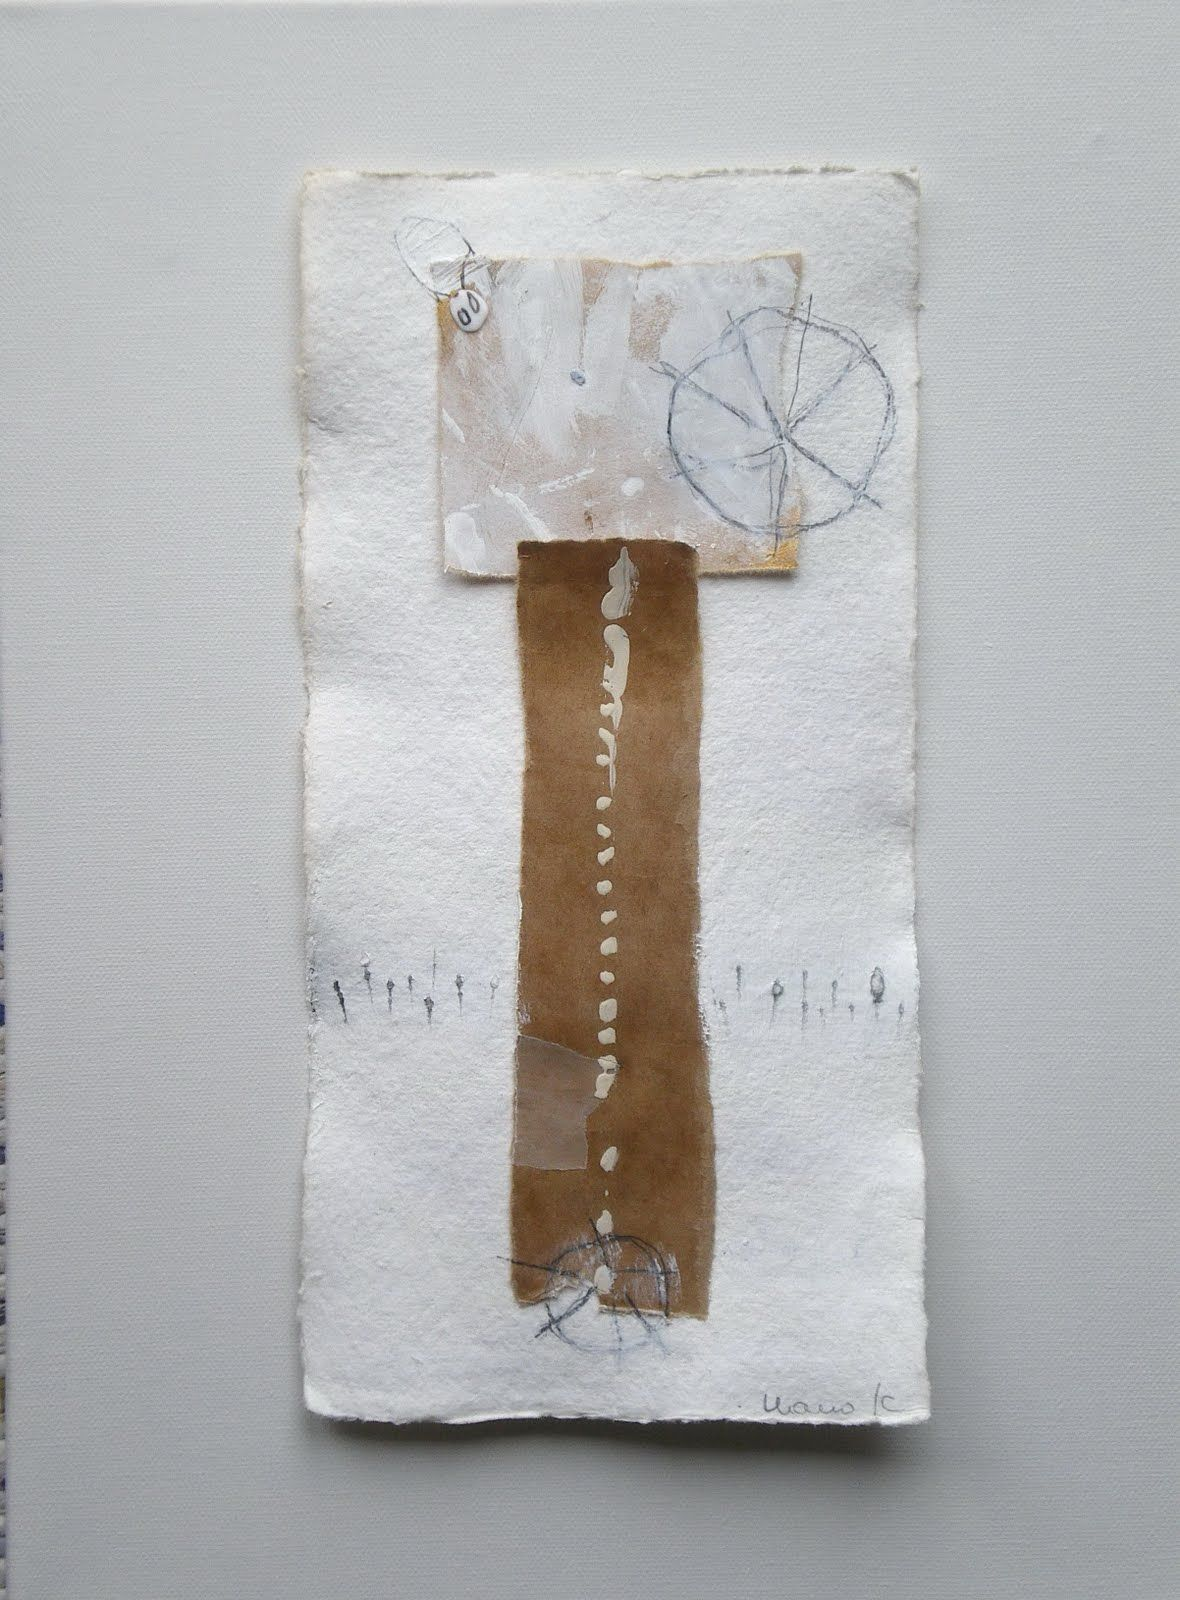 mano kellner  collage / painting 15 x 30 cm